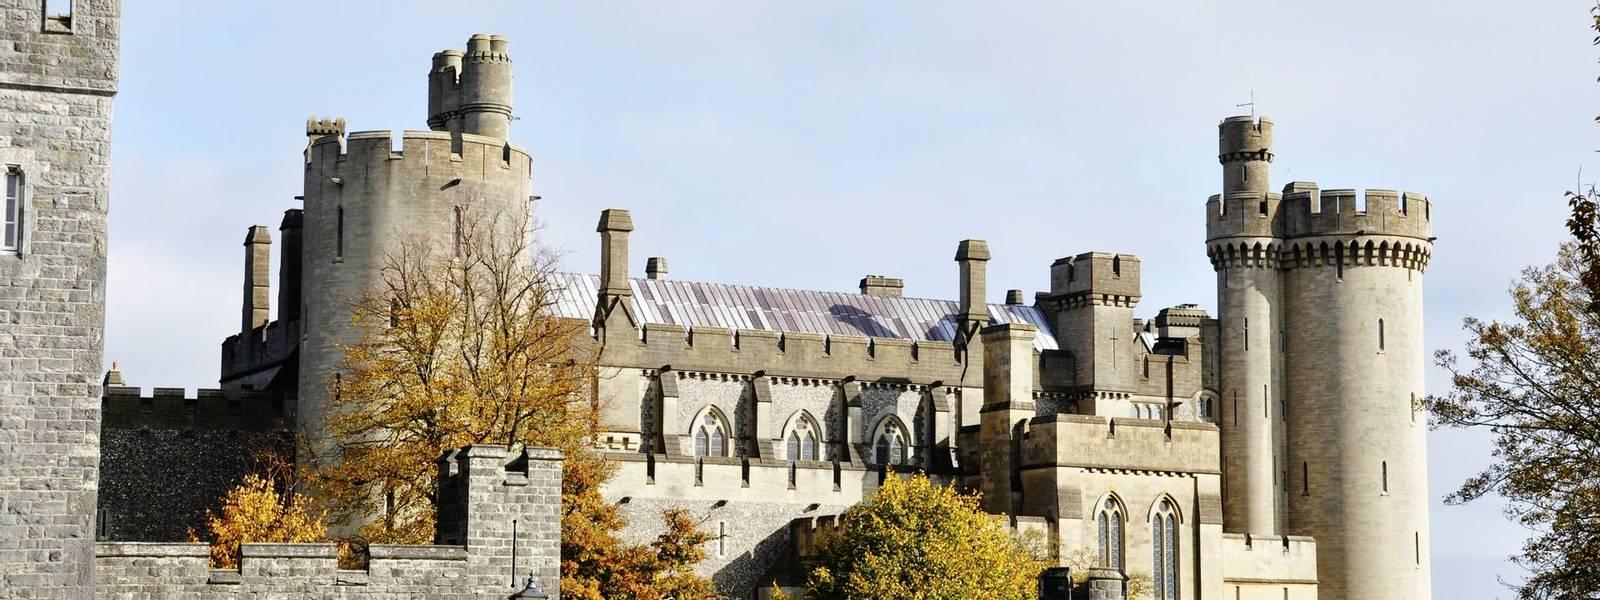 South_Downs_Arundel_Castle_Autumn_AdobeStock_27573310.jpeg